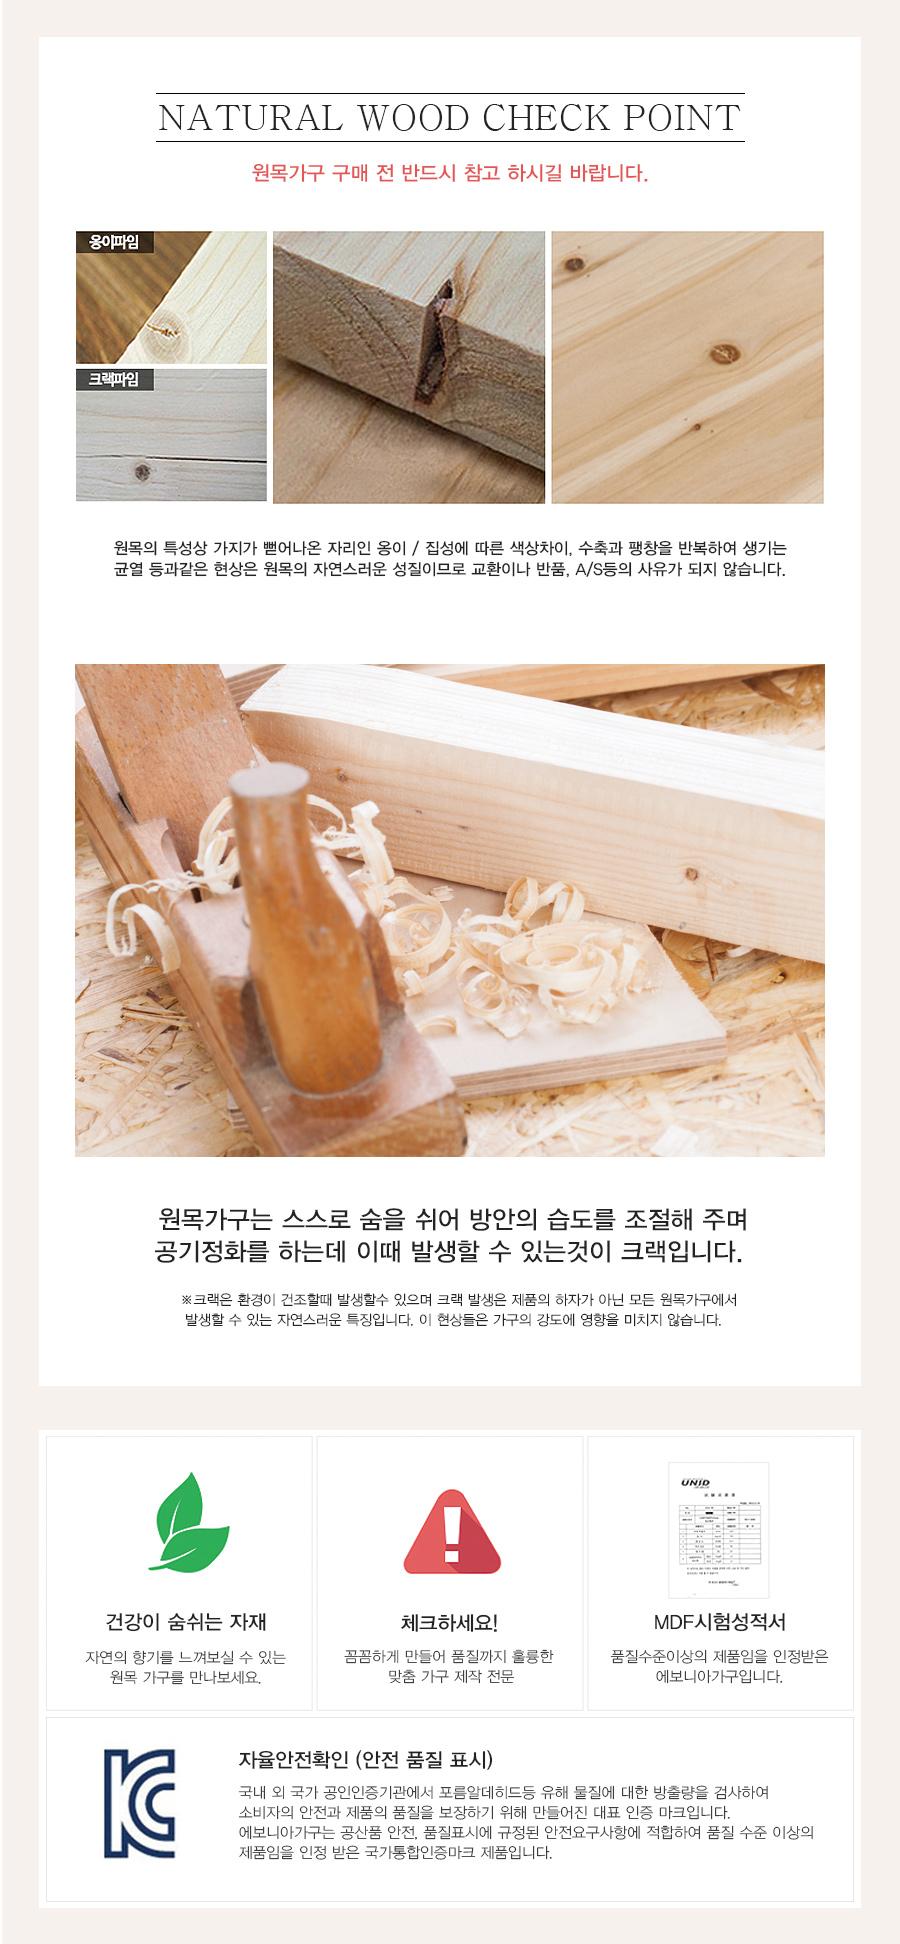 02-8_notice.jpg